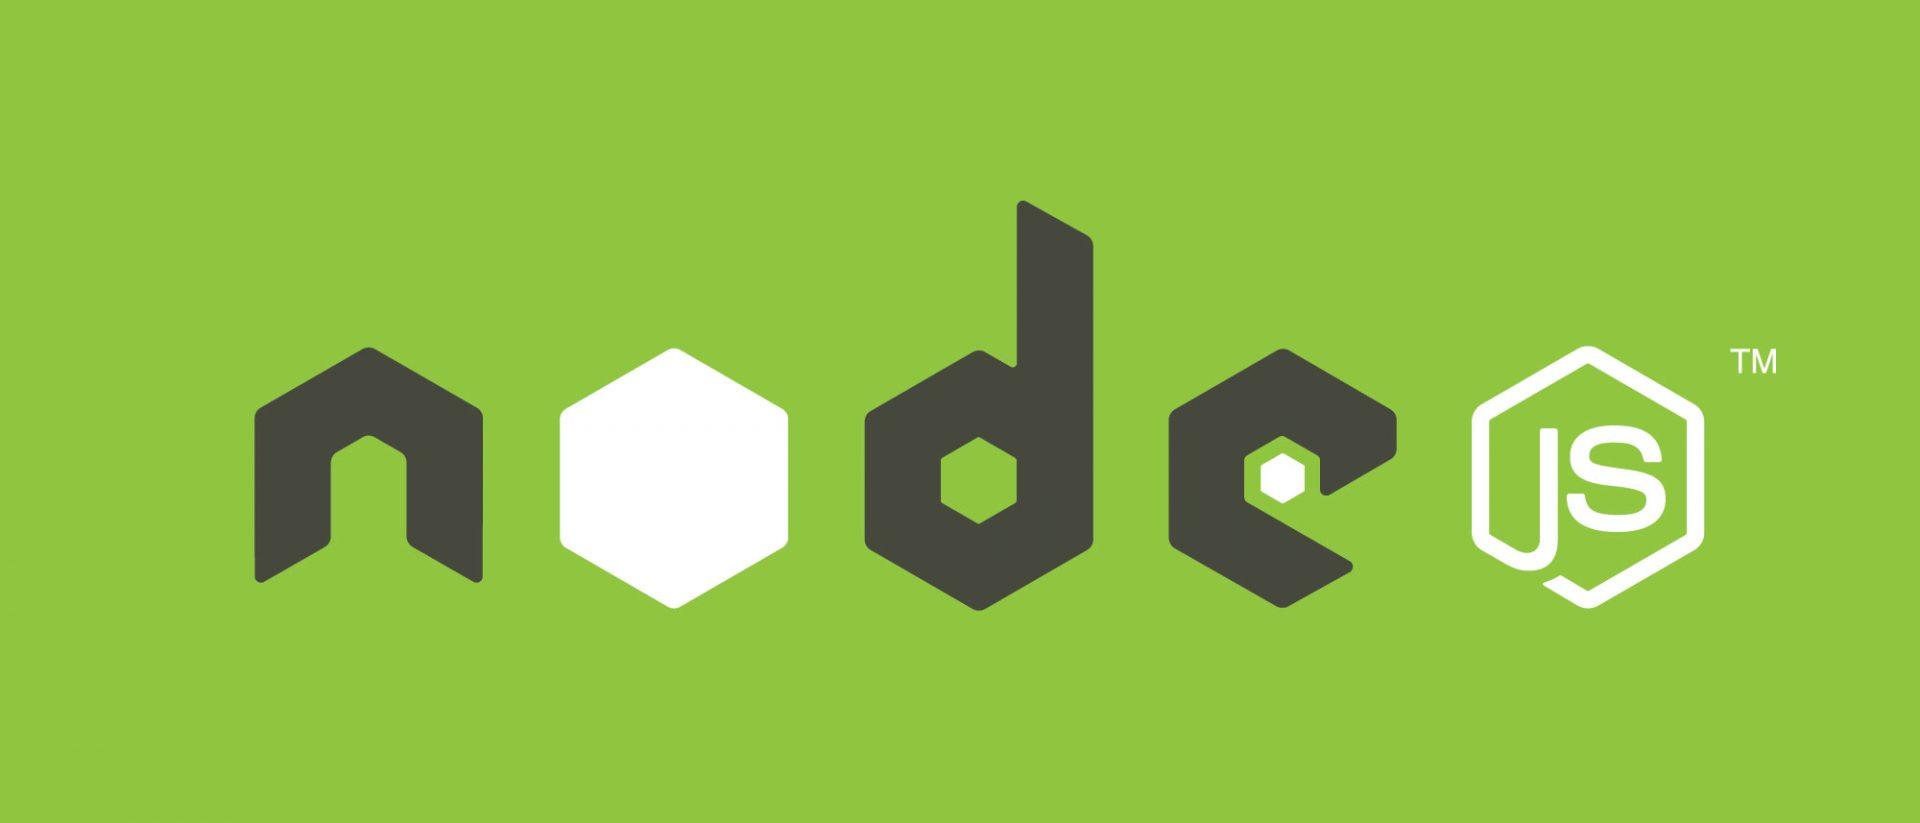 تعویض نسخه nodejs به صورت آنی switch nodejs version